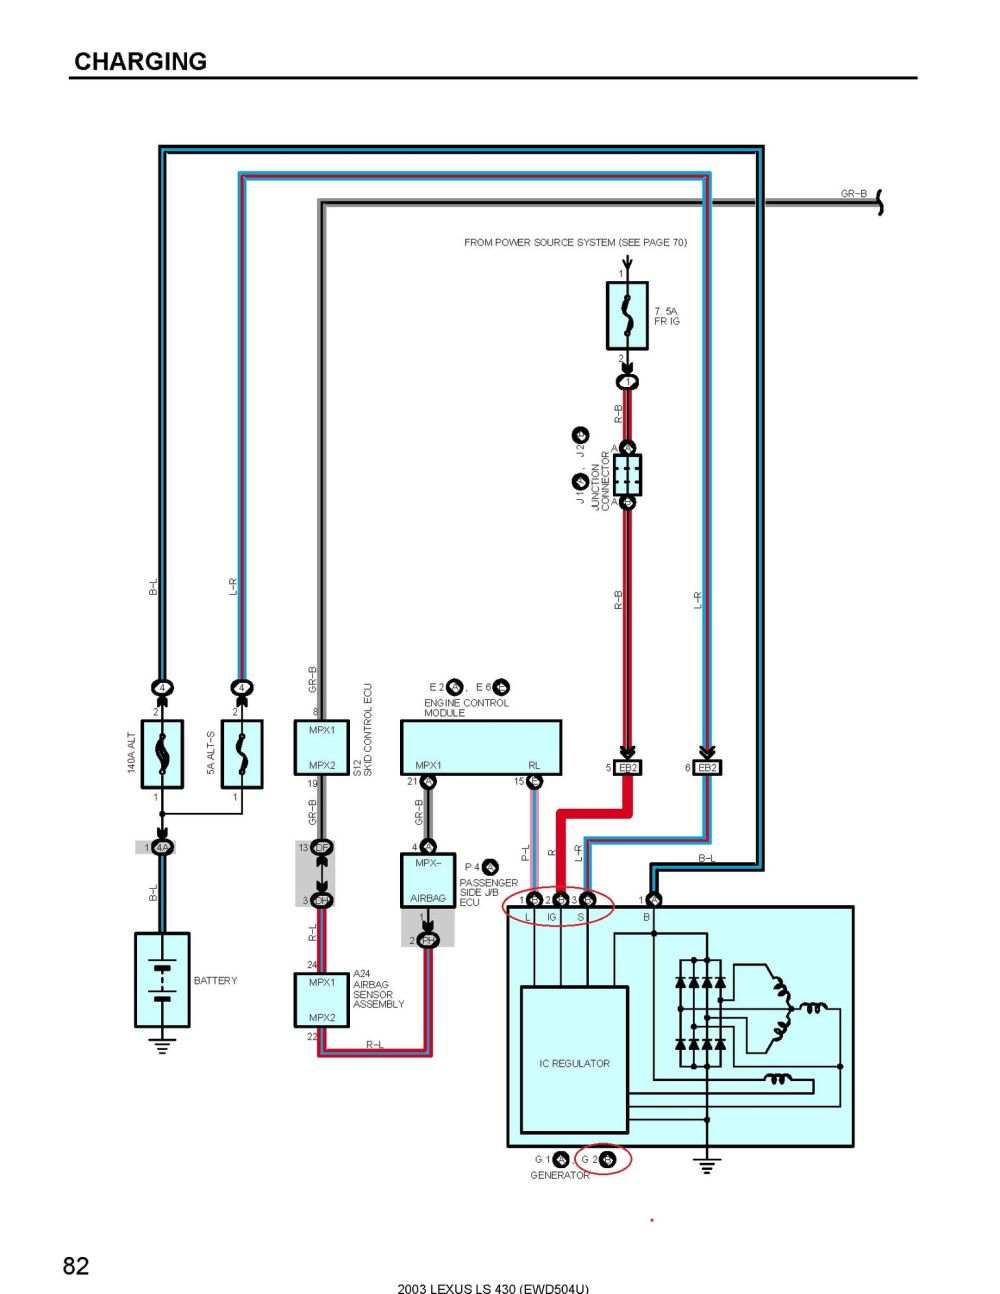 medium resolution of 2003 ls430 alternator wiring clublexus lexus forum 2001 lexus ls430 wiring diagram 2001 lexus ls430 wiring